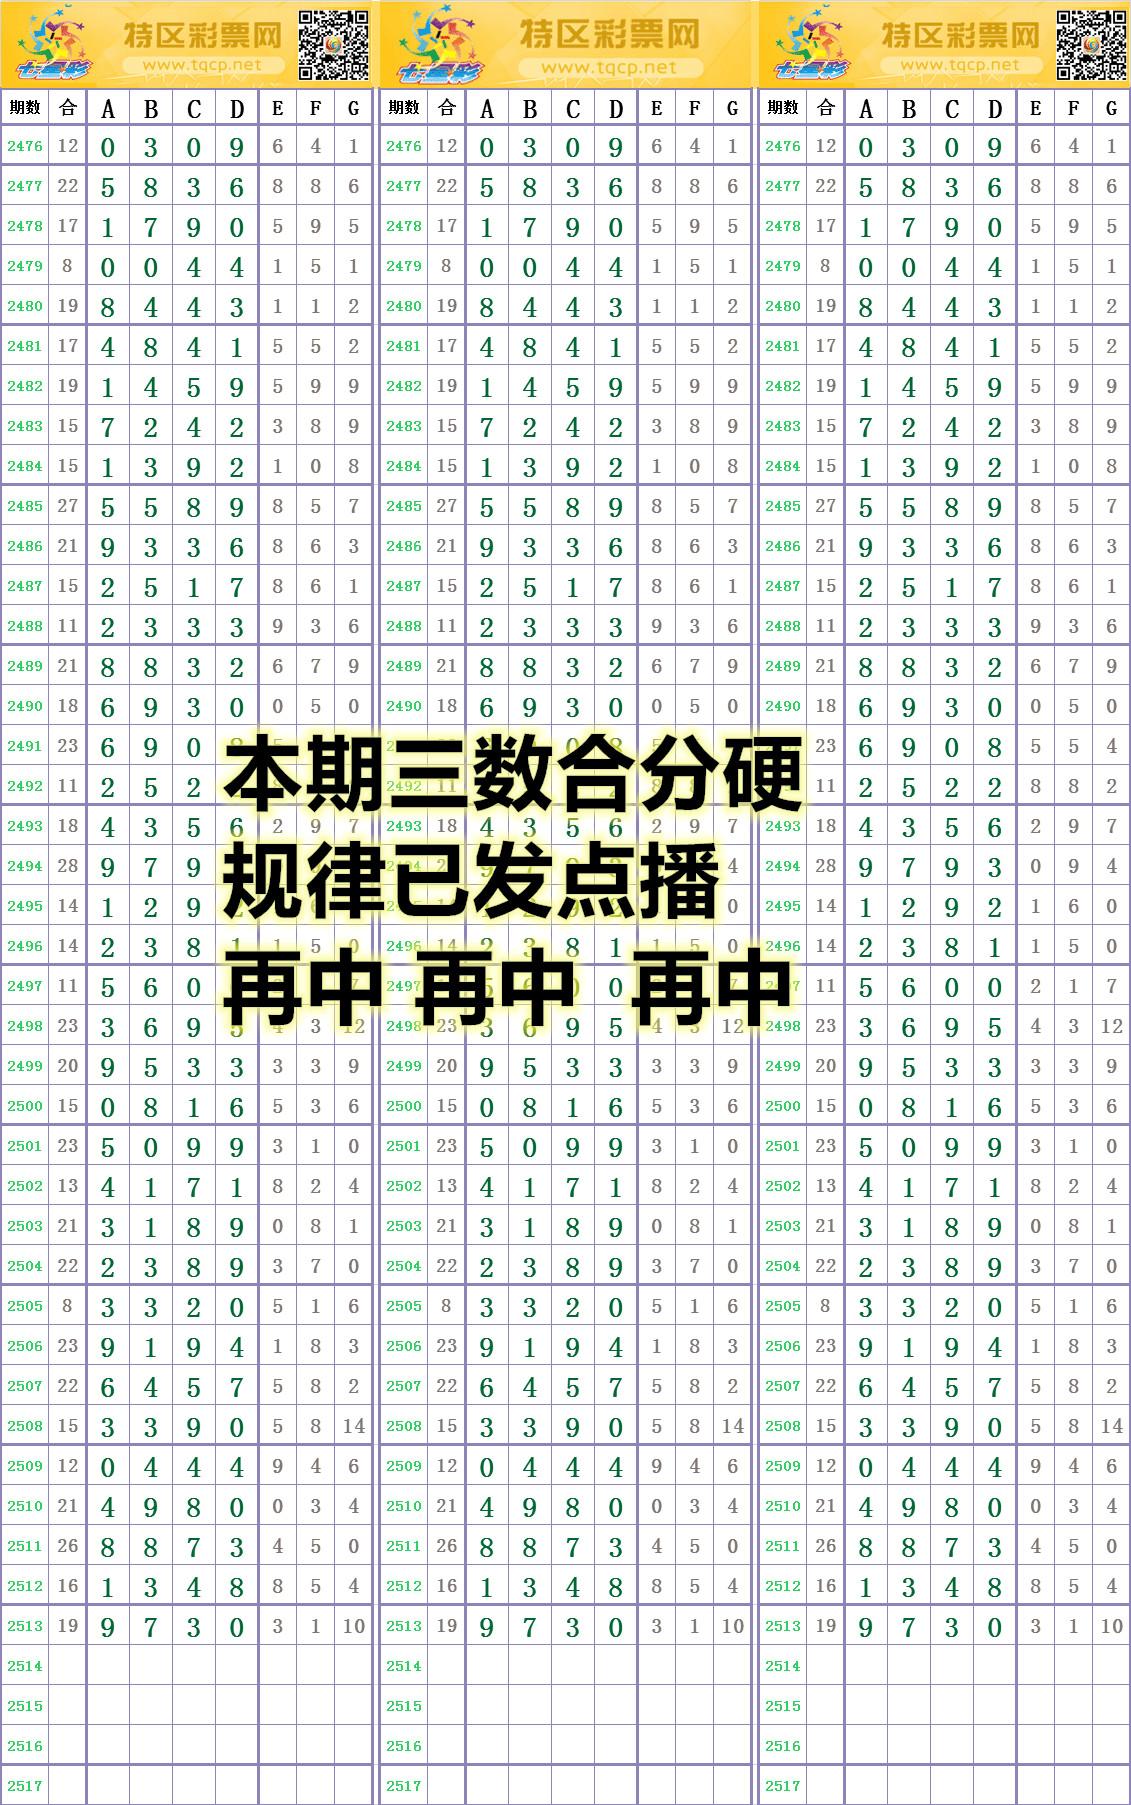 204526m8o3exax8oe64pm3_副本.jpg